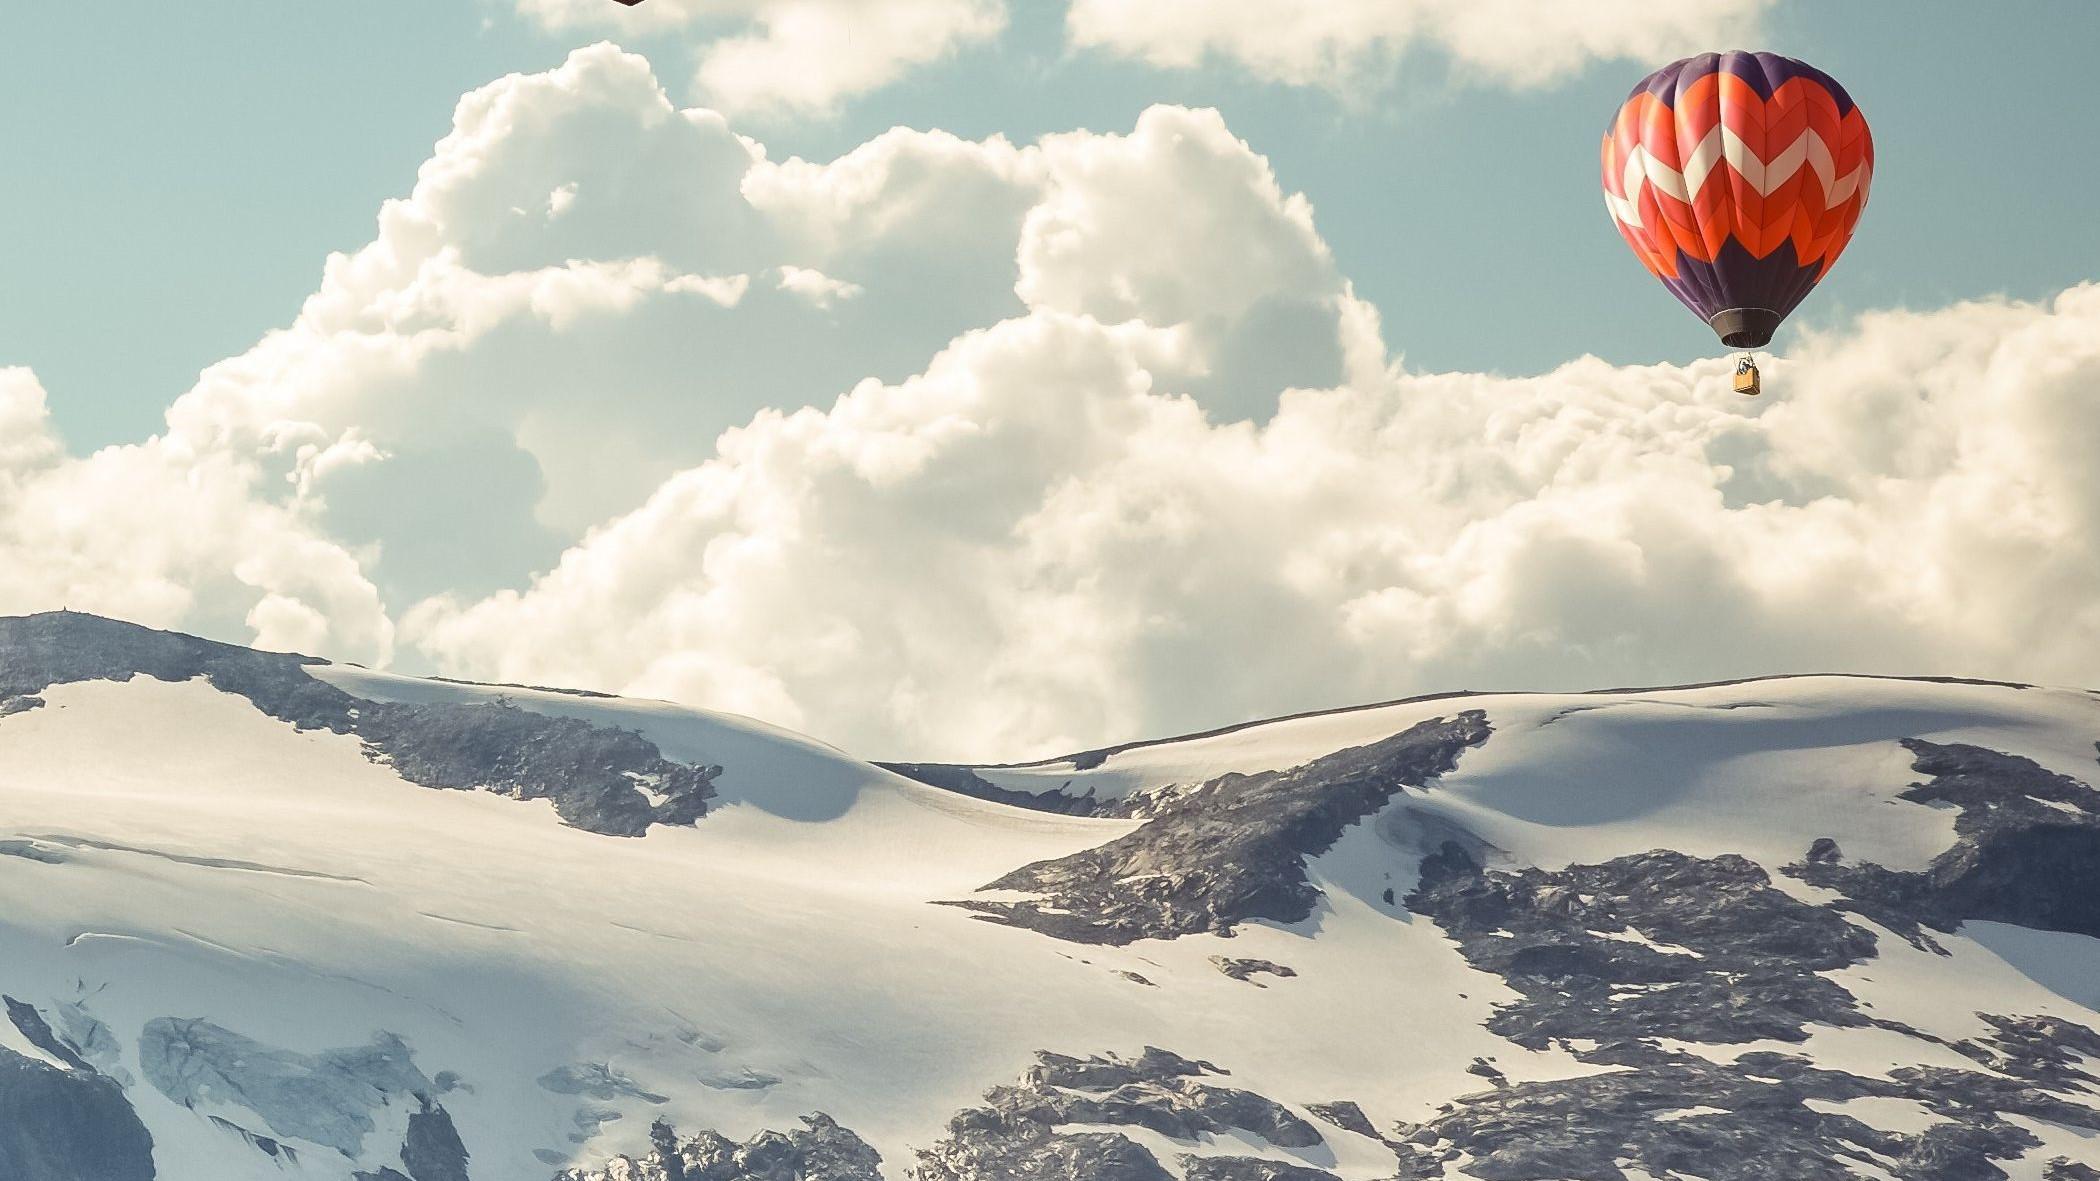 hot air balloon over the himalayas